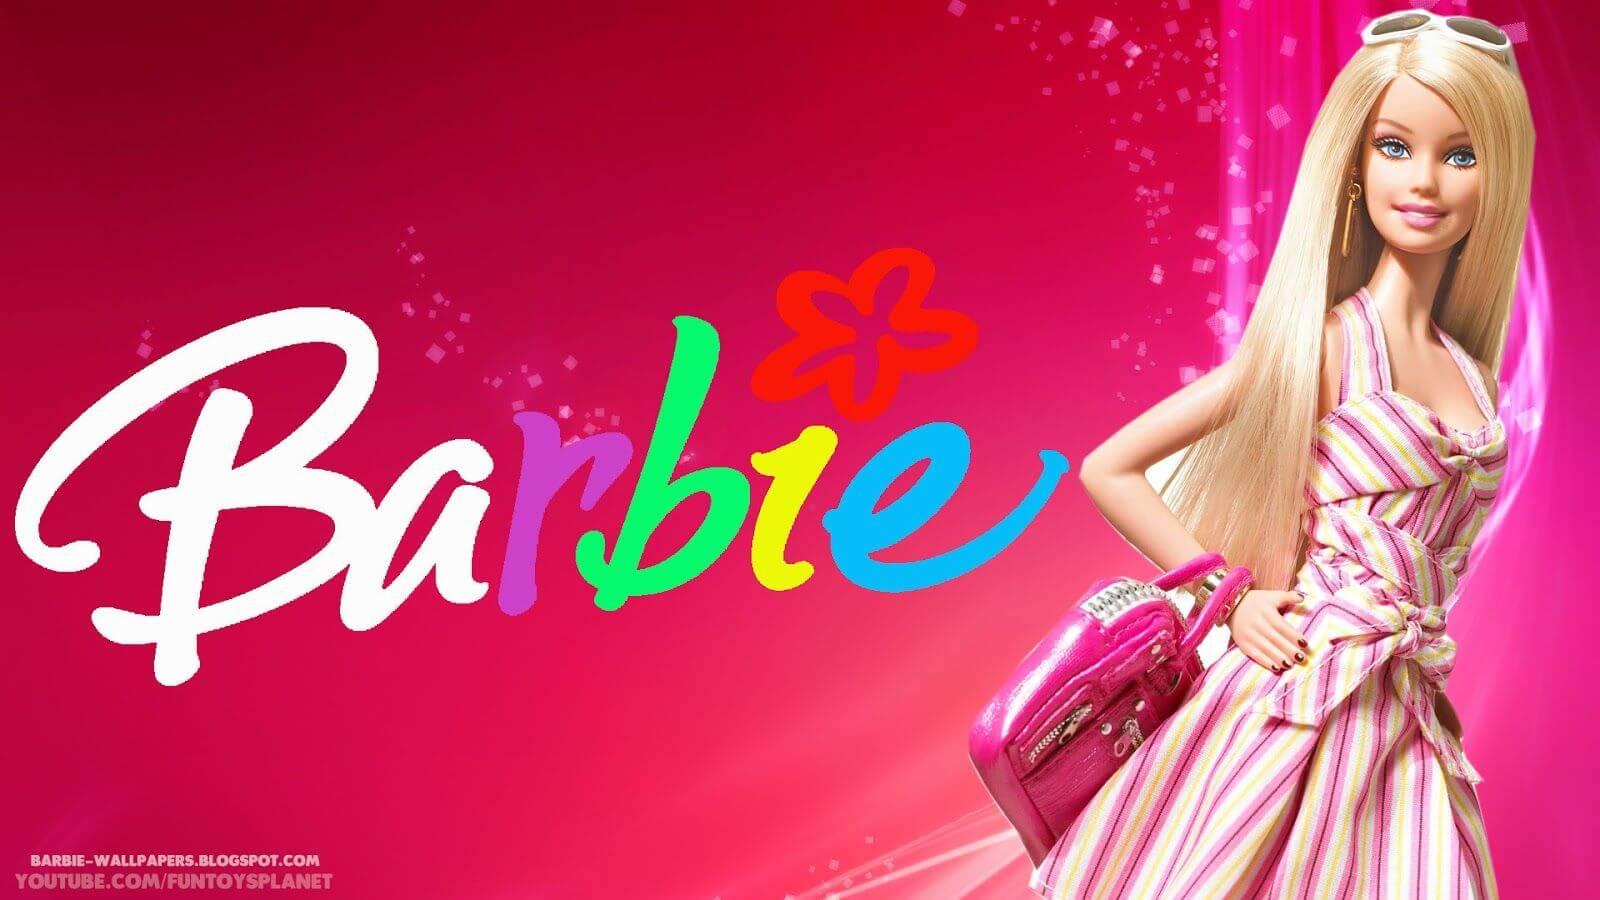 wp2538683 barbies wallpaper - پرده پانچ چاپی باربی - - kids-curtains